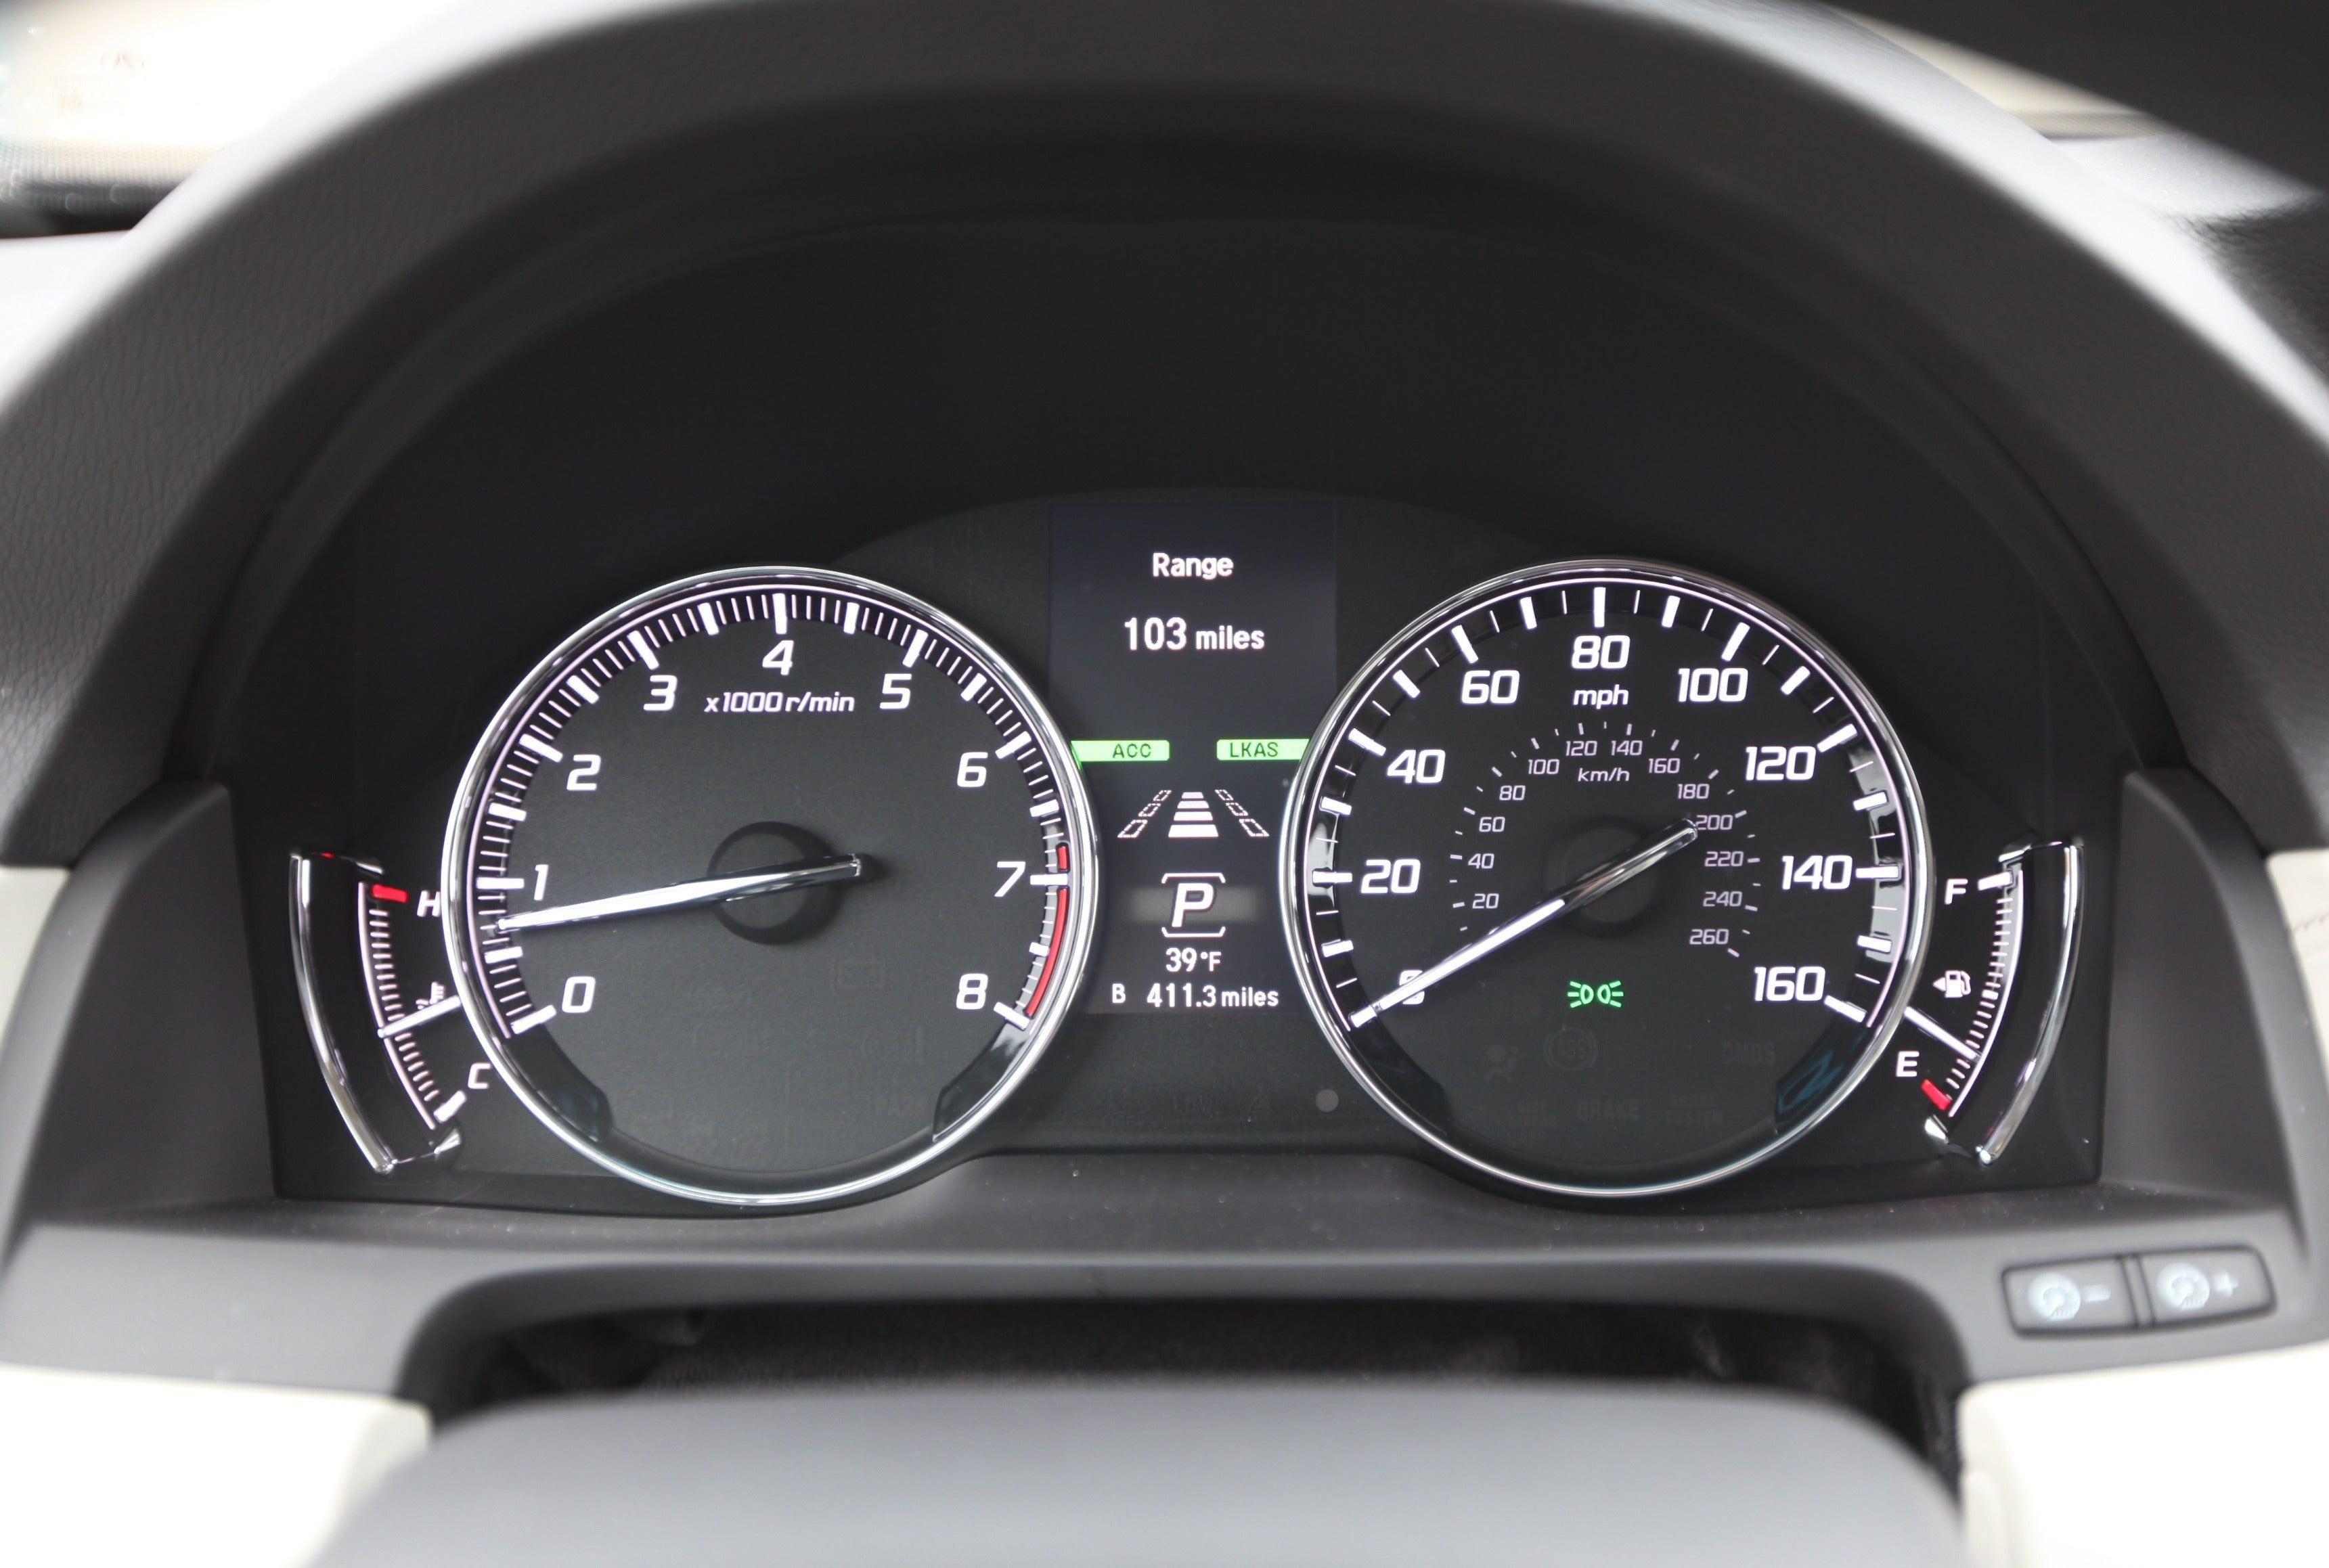 Gimme A Brake The Acura RLX Advance Handles Stopandgo - Used acura rlx